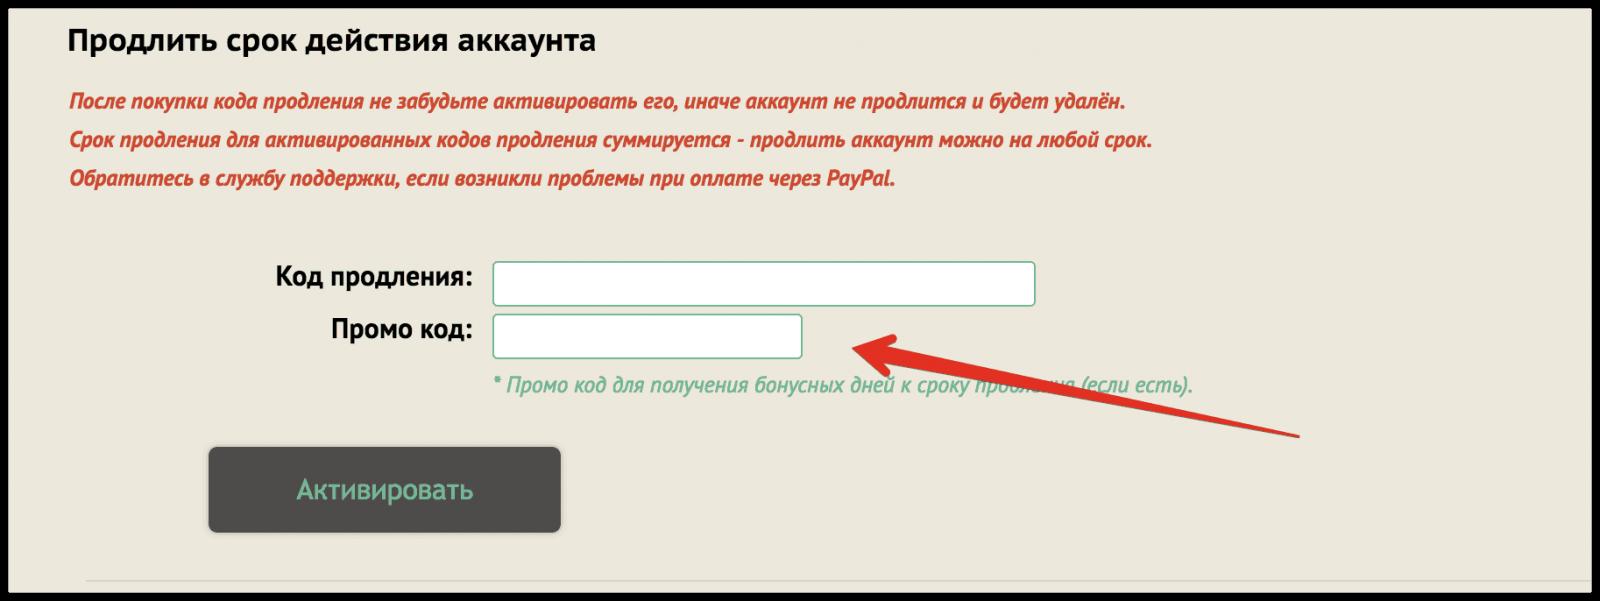 скриншот из личного кабинета fineproxy